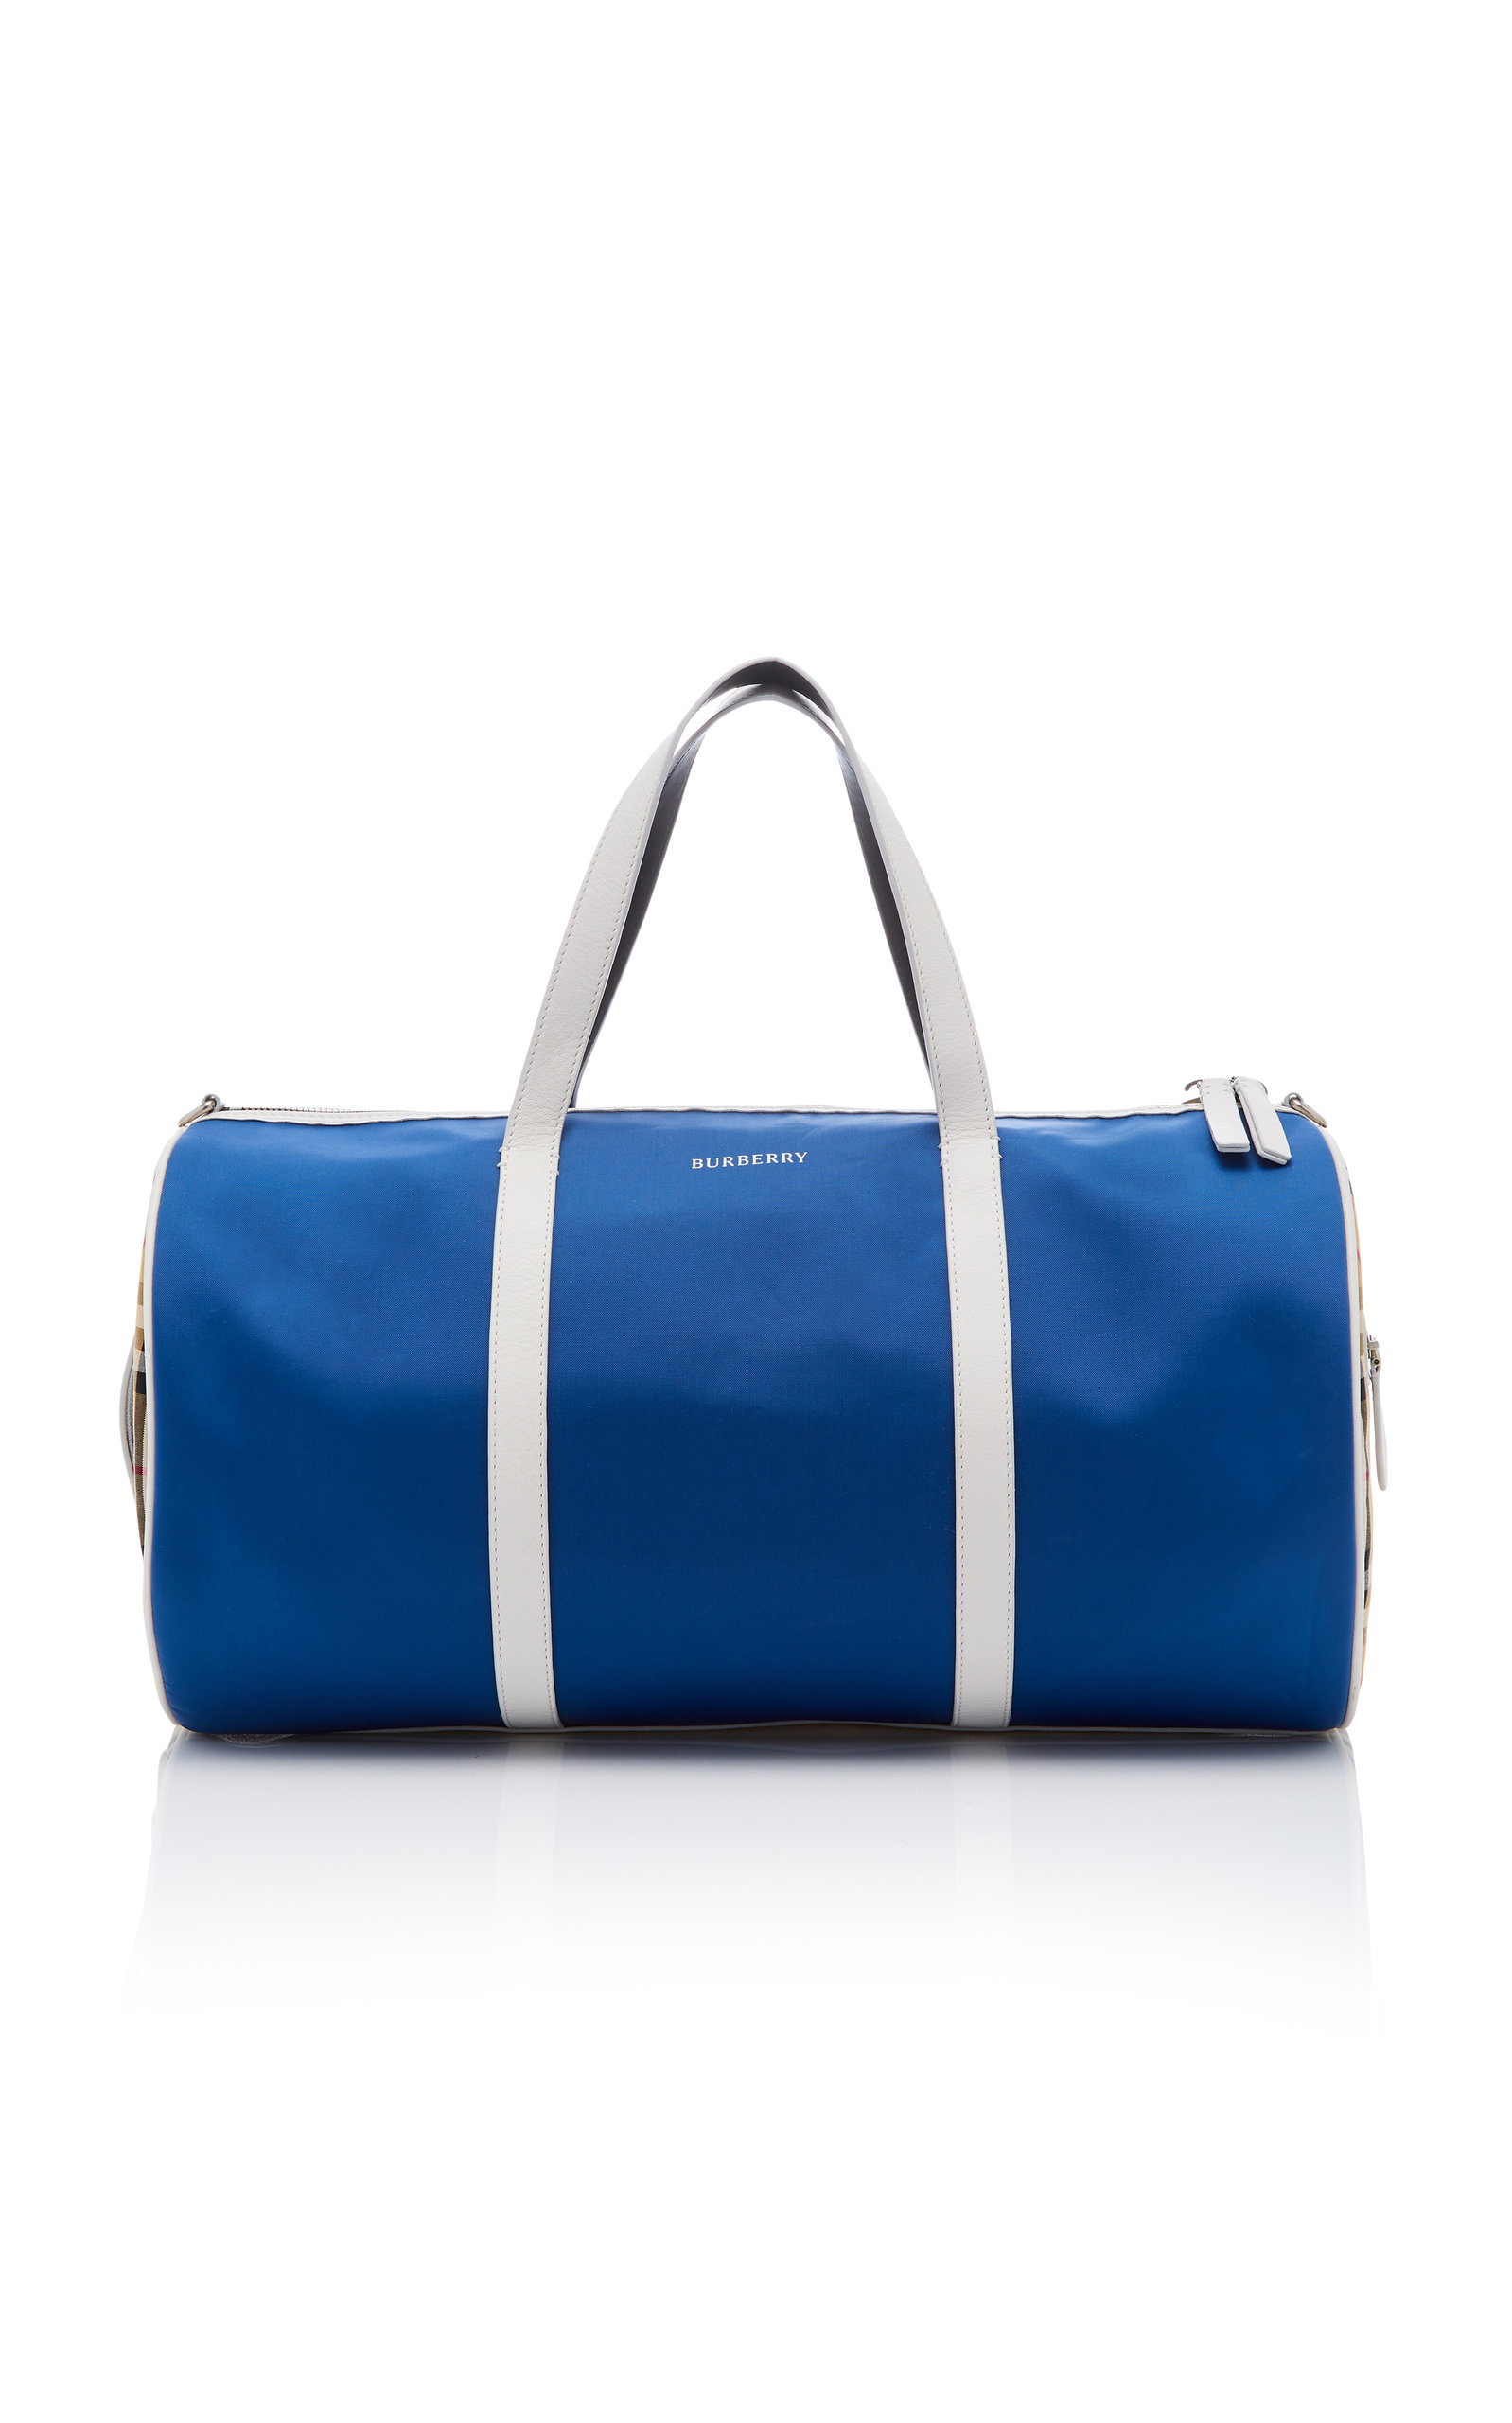 2a5371215d Kennedy Duffle Bag by Burberry   Moda Operandi